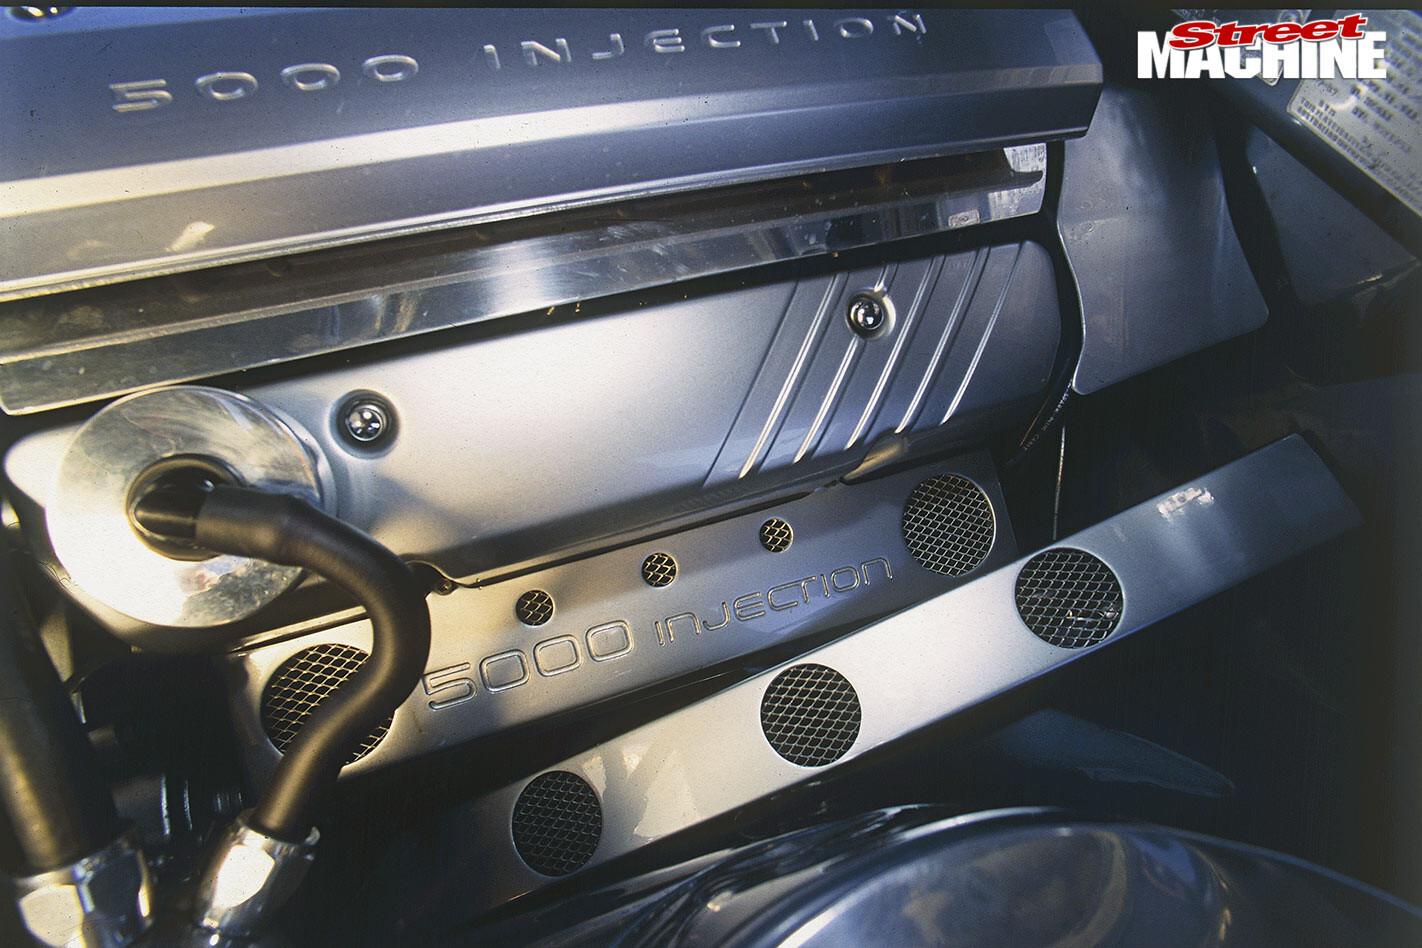 Holden VL Calais engine